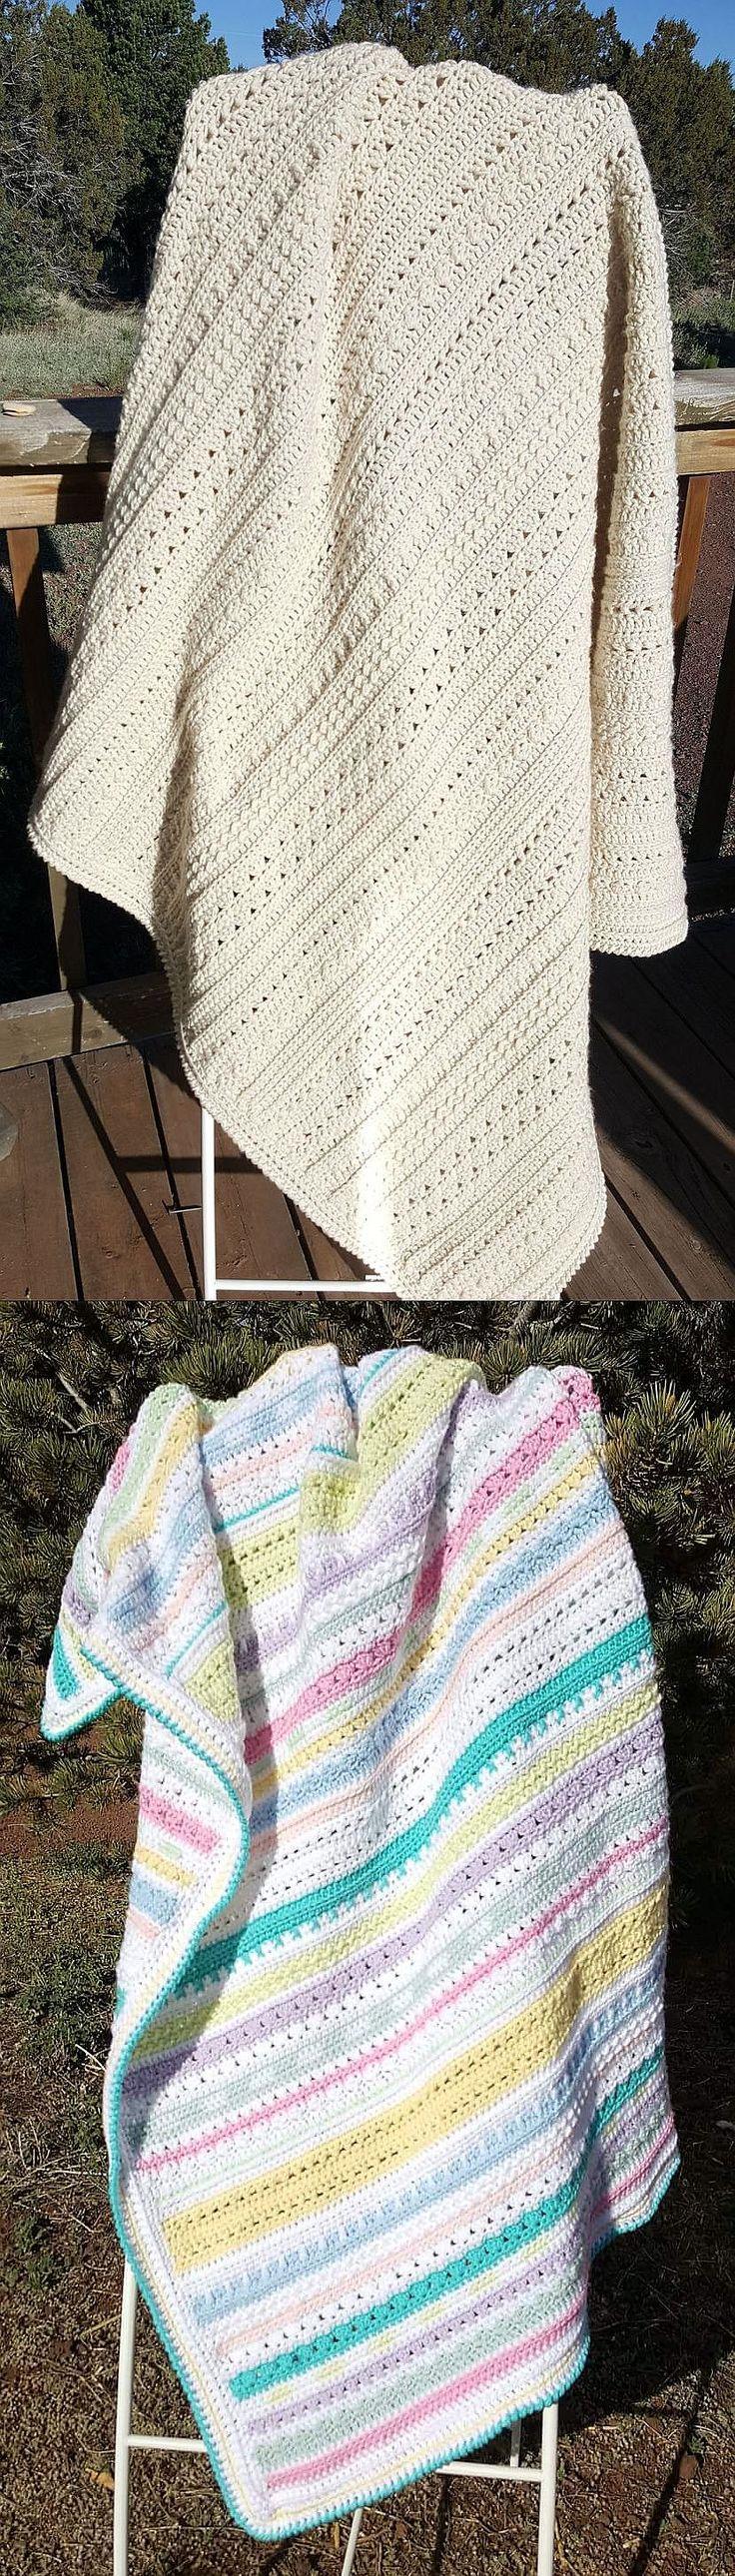 Asombroso Patrón De Crochet Afghan Rayado Modelo - Manta de Tejer ...